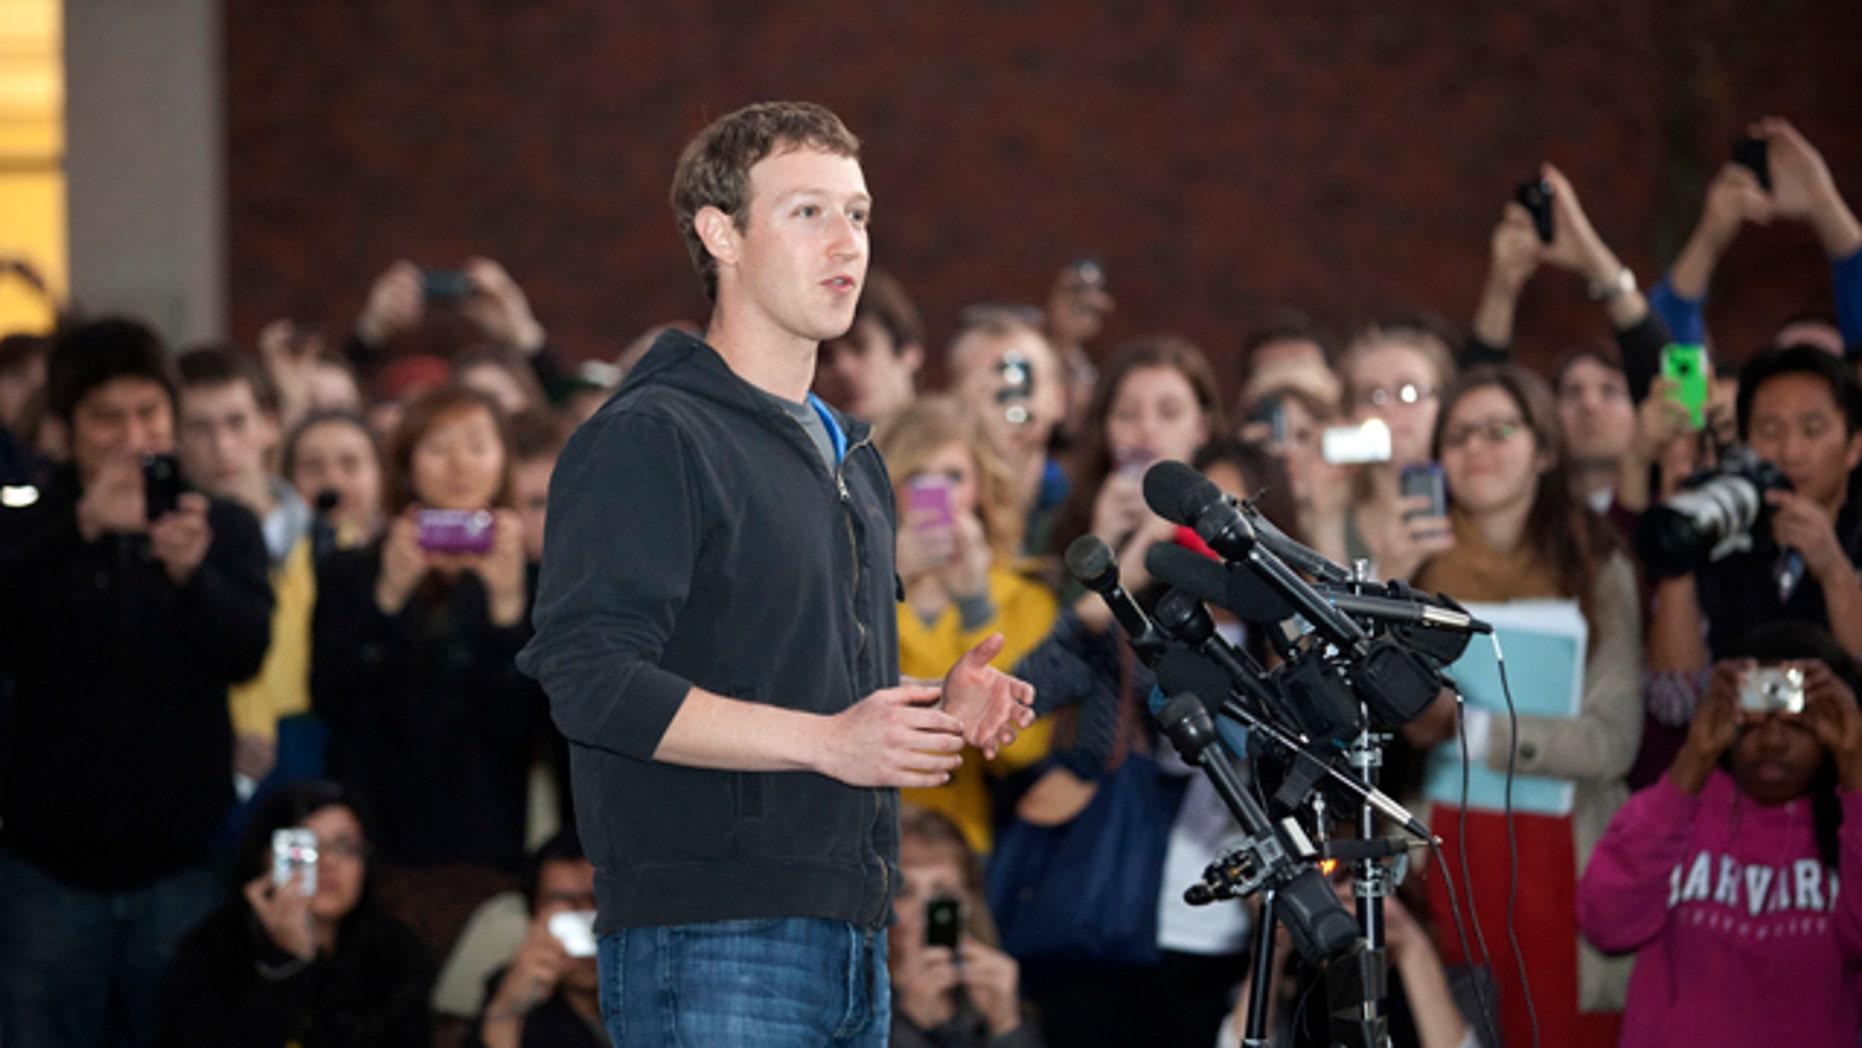 Nov. 7, 2011: Facebook creator Mark Zuckerberg speaks to students outside Lamont Library on the campus of Harvard University, in Cambridge, Mass.